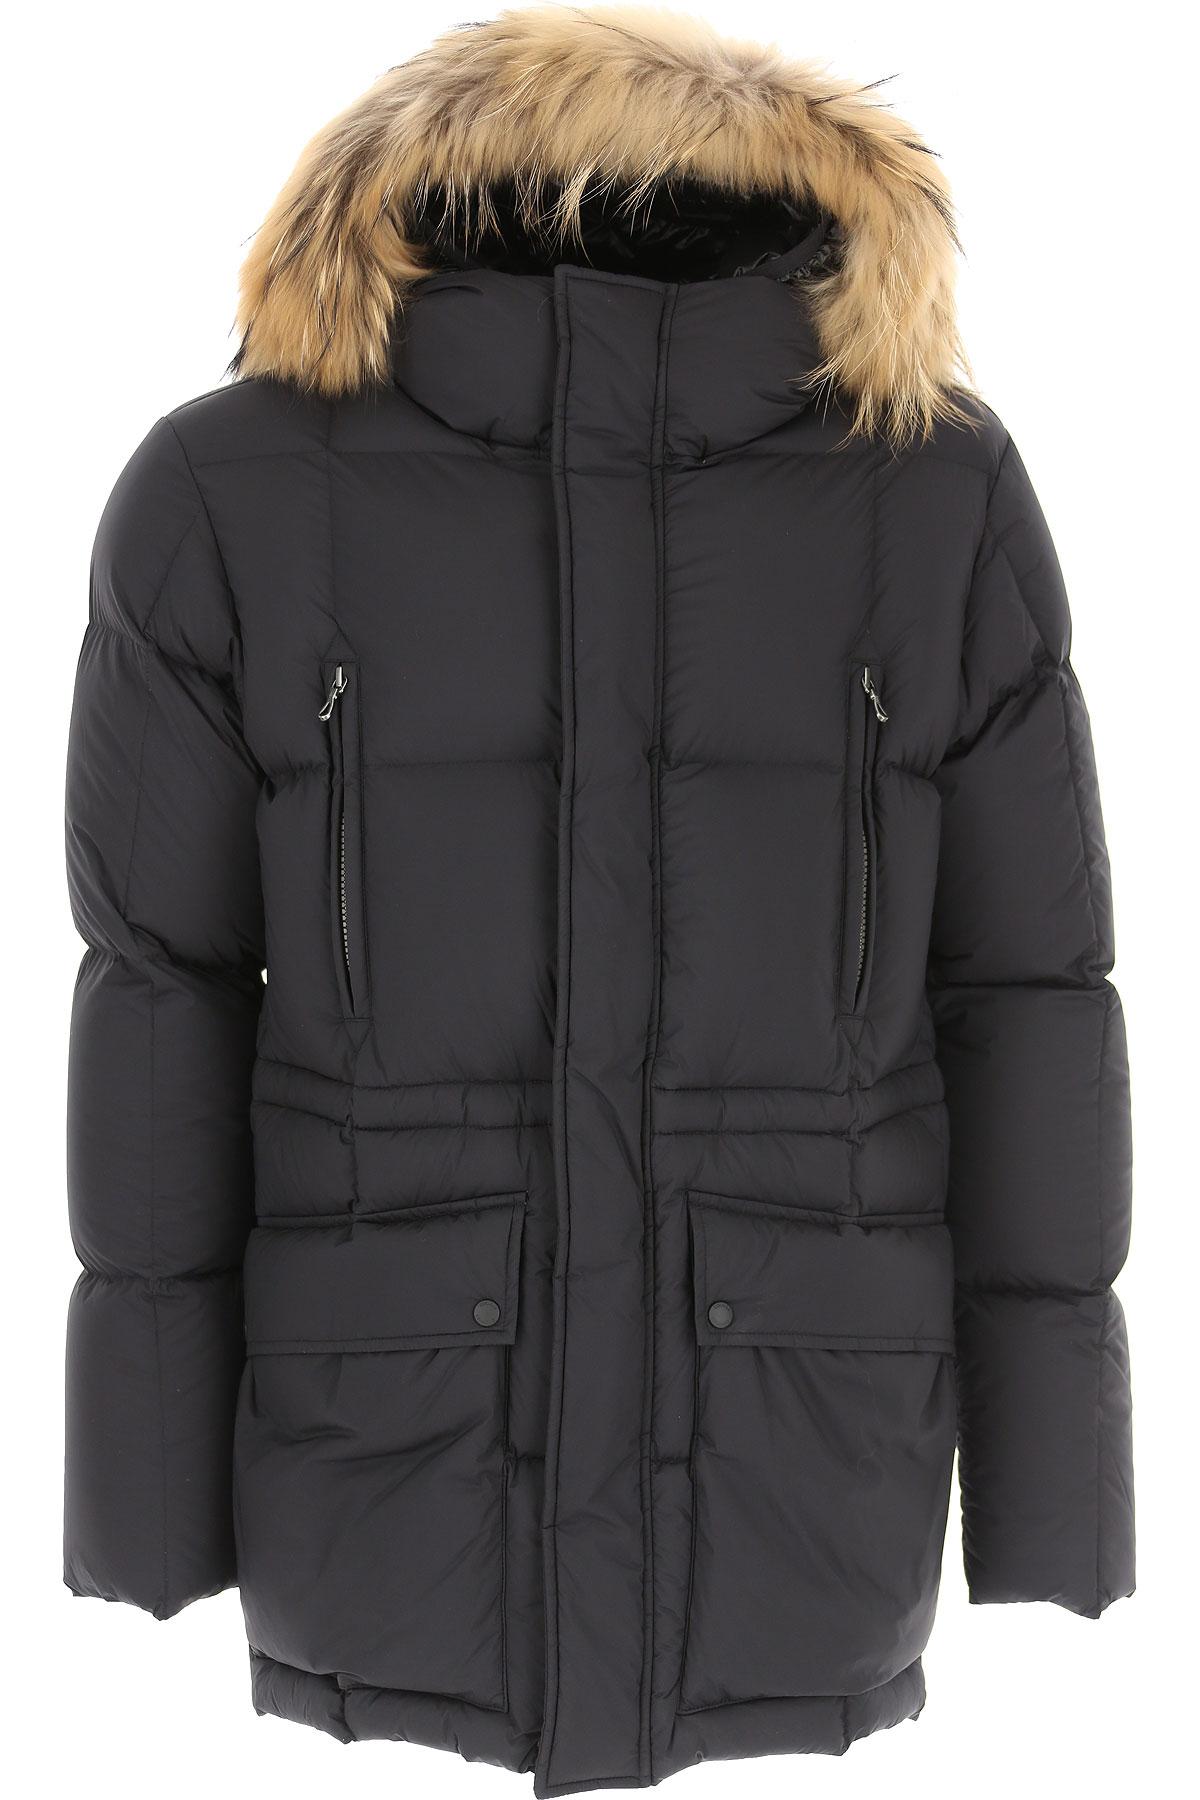 Colmar Down Jacket for Men, Puffer Ski Jacket On Sale, Black, polyamide, 2019, M XXL